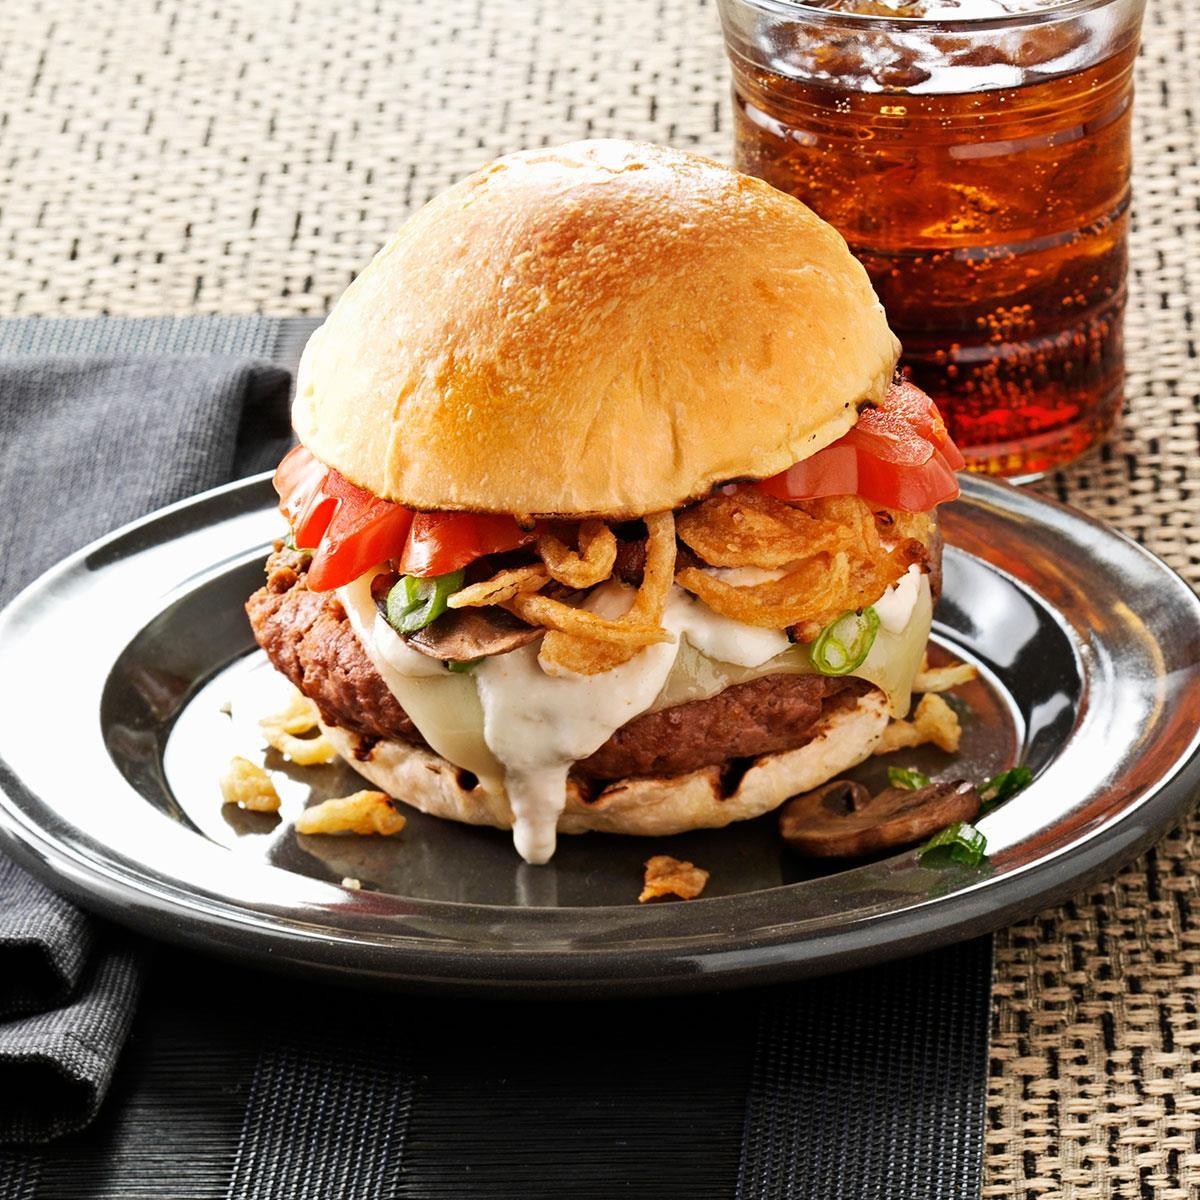 Steak House Burgers Recipe | Taste of Home